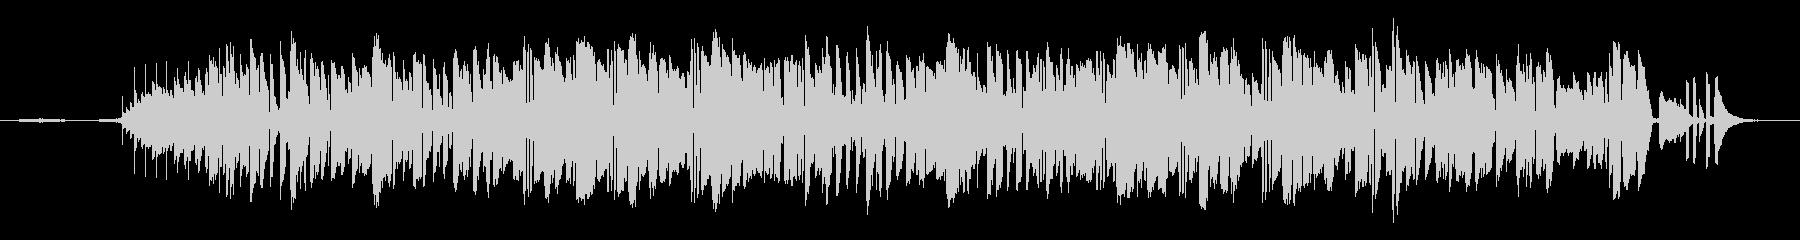 Oyasumi Songの未再生の波形